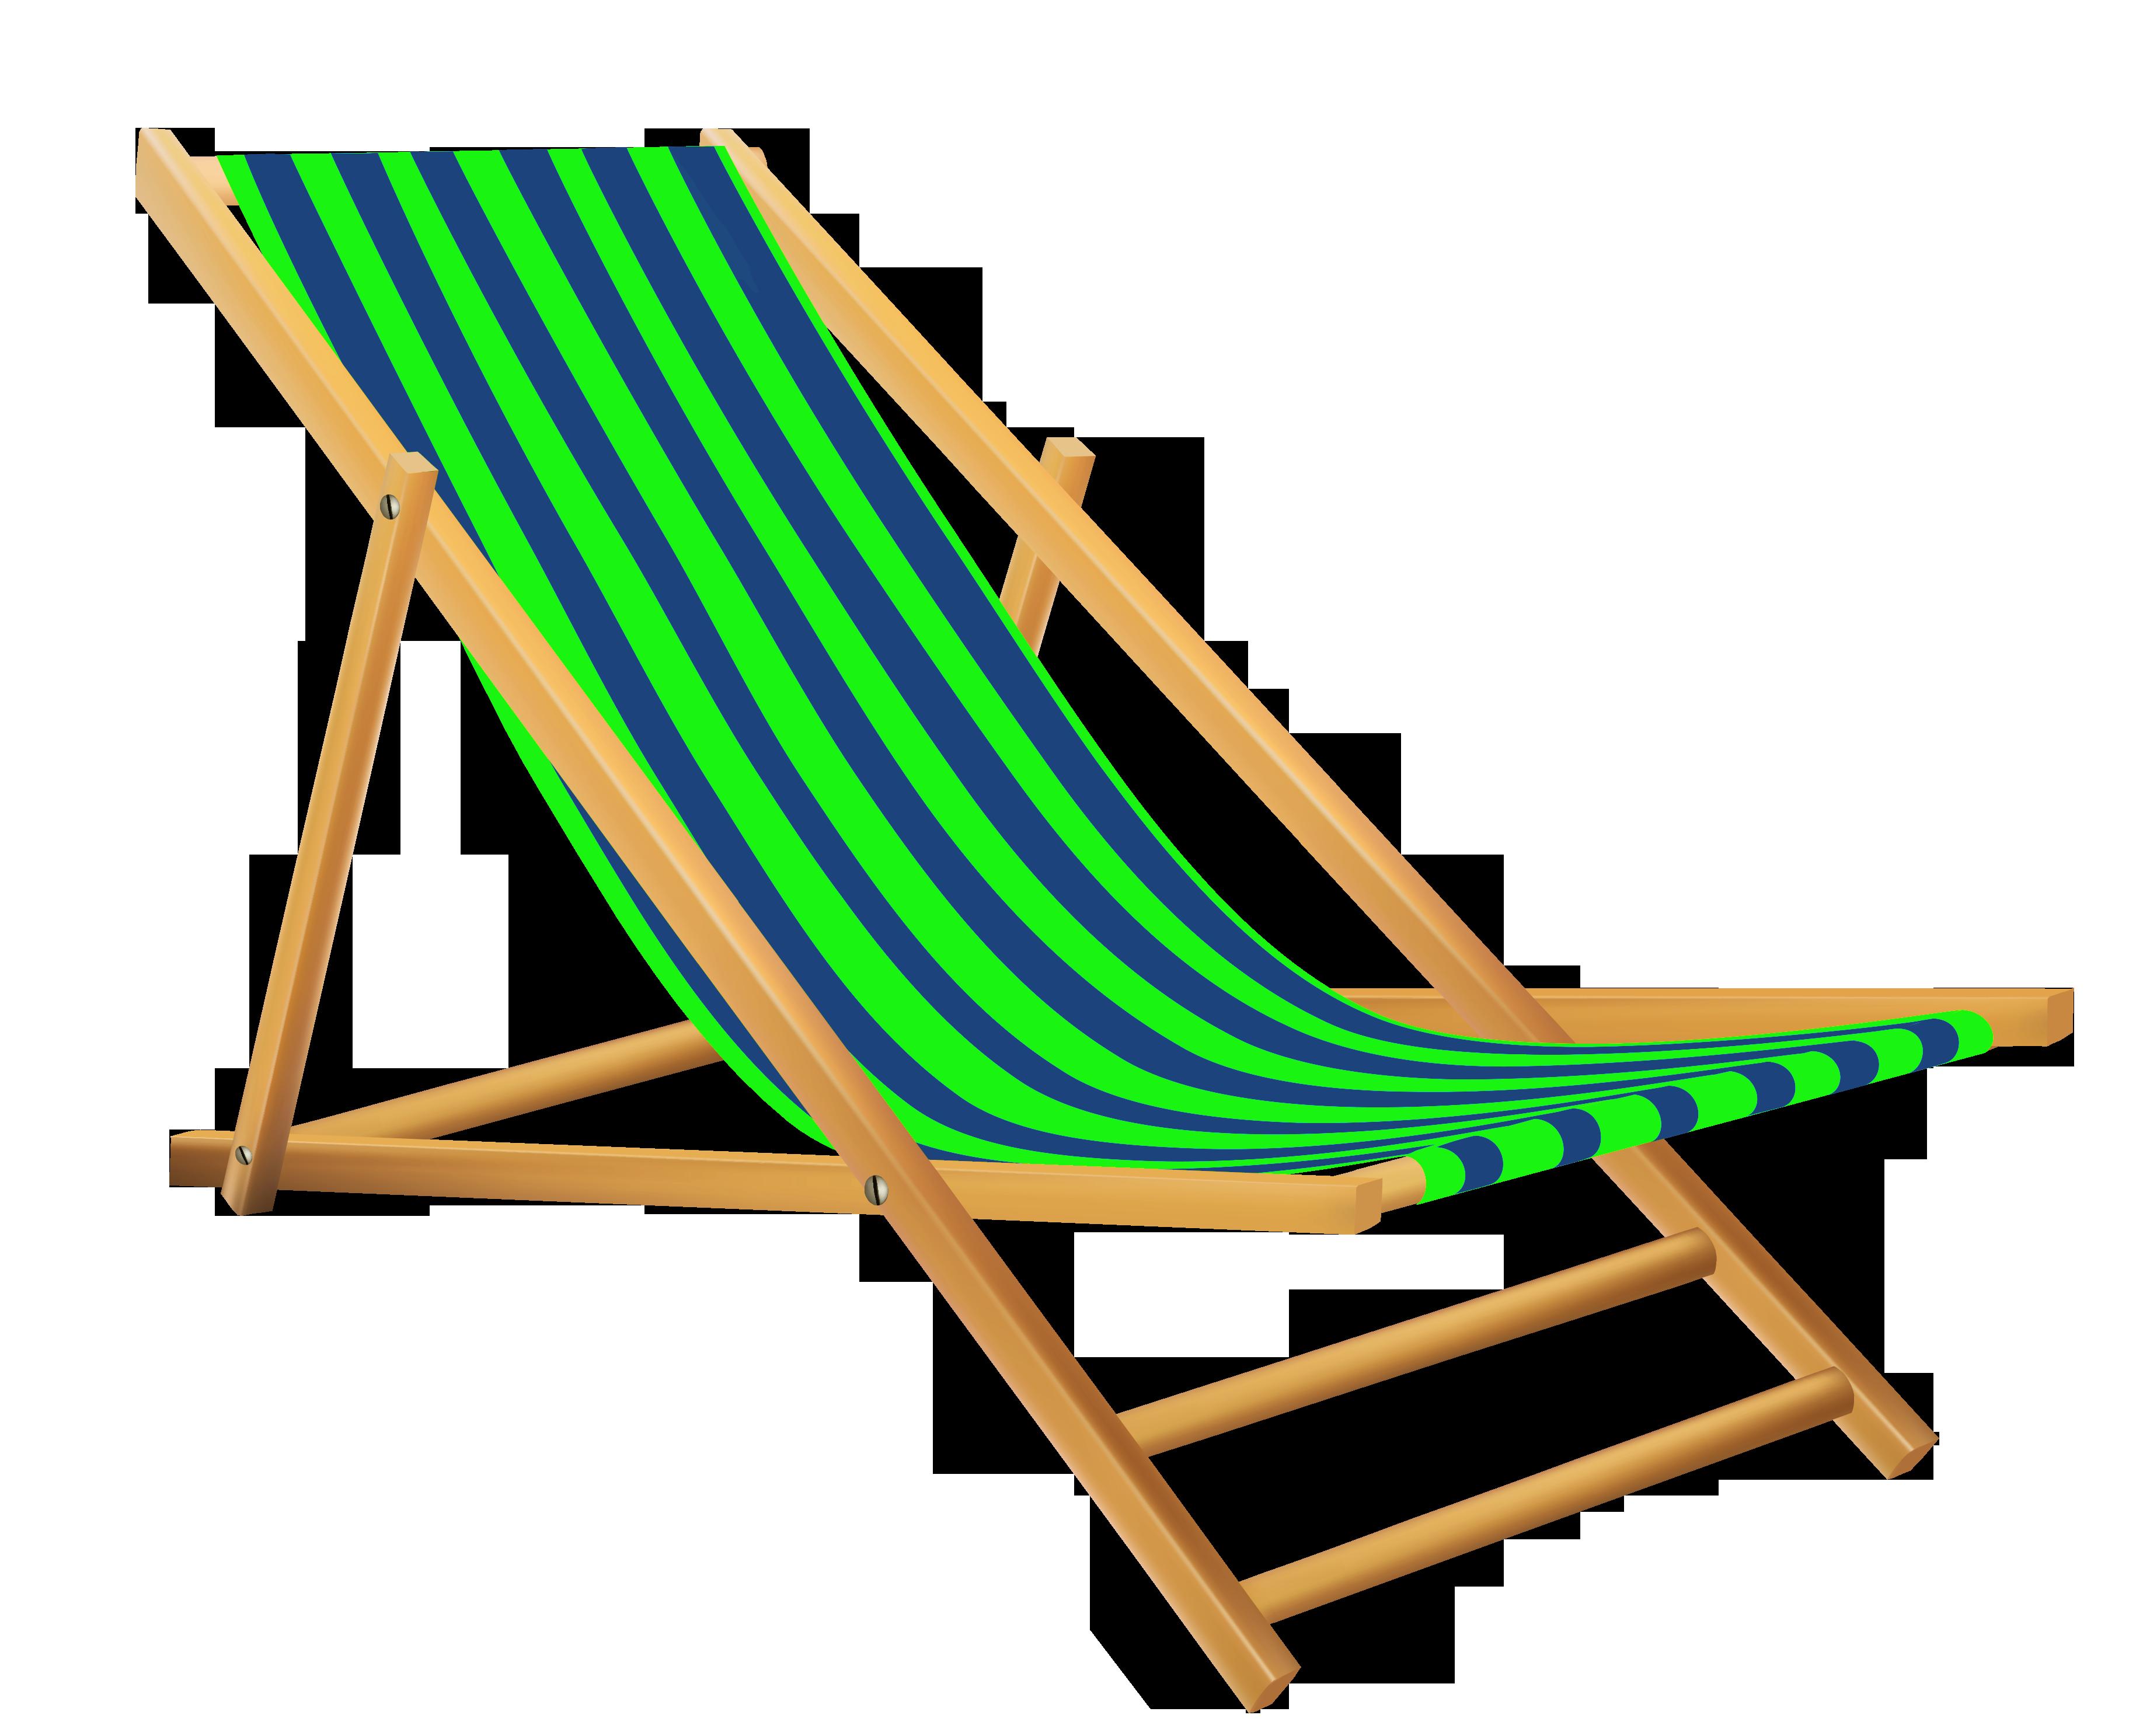 Folding outdoor lounge chair - Folding Lawn Chair Clip Art Www Galleryhip Com The